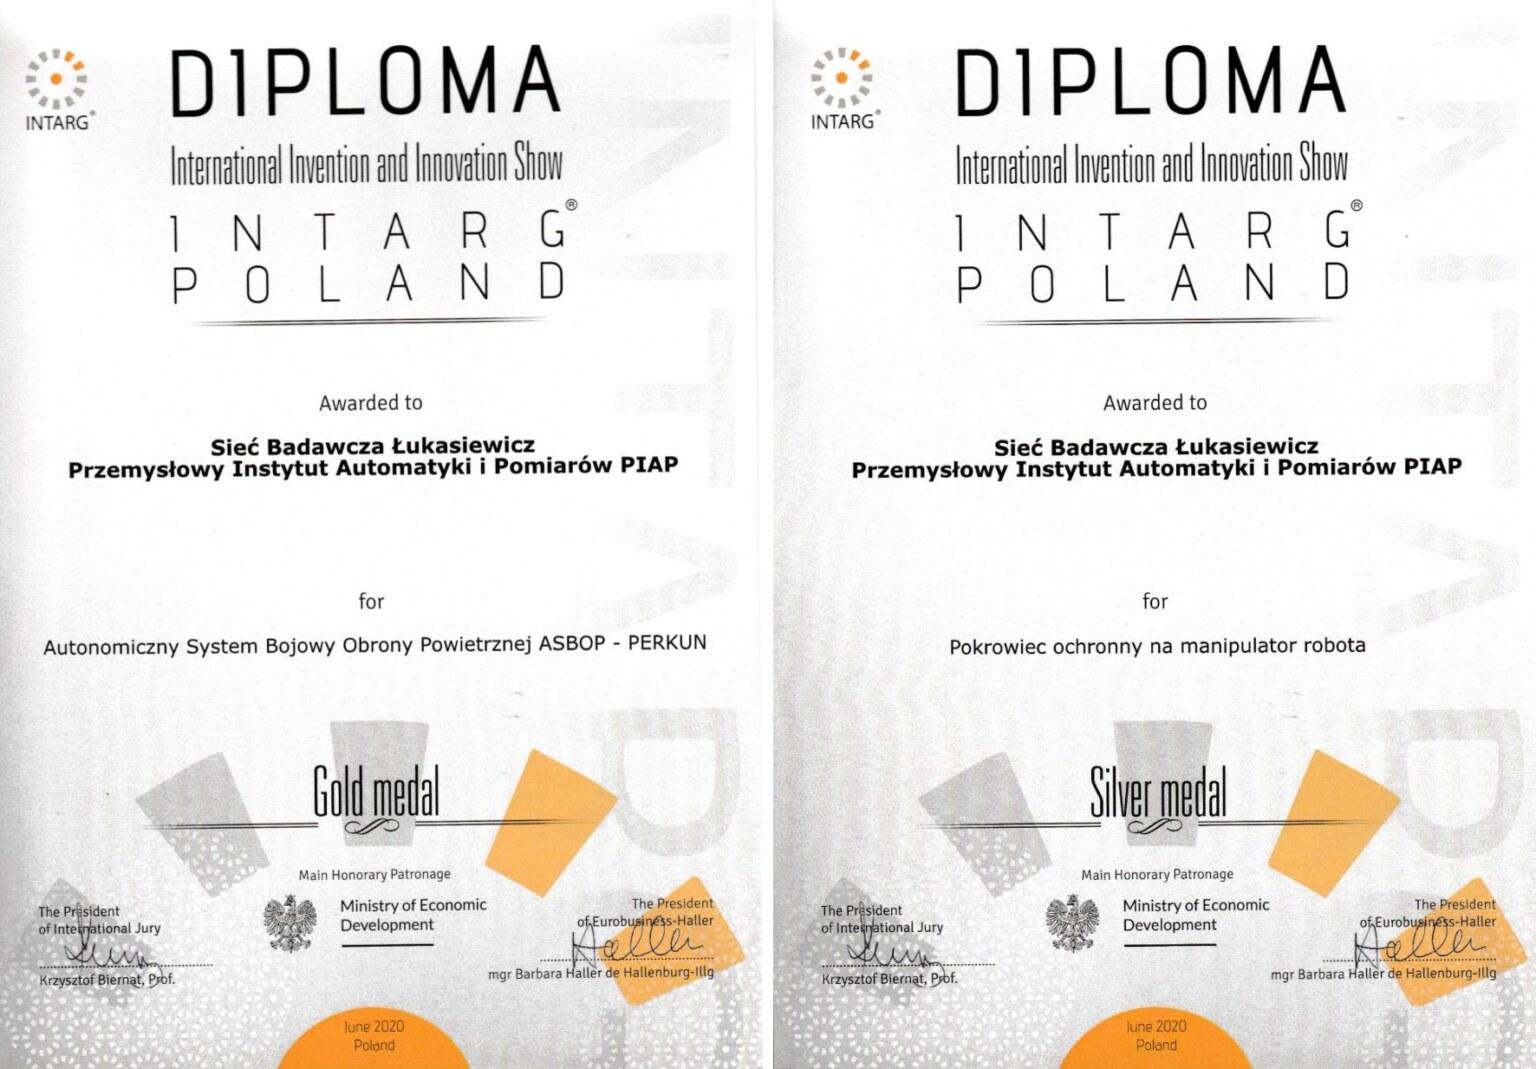 dwa dyplomy Intarg ok